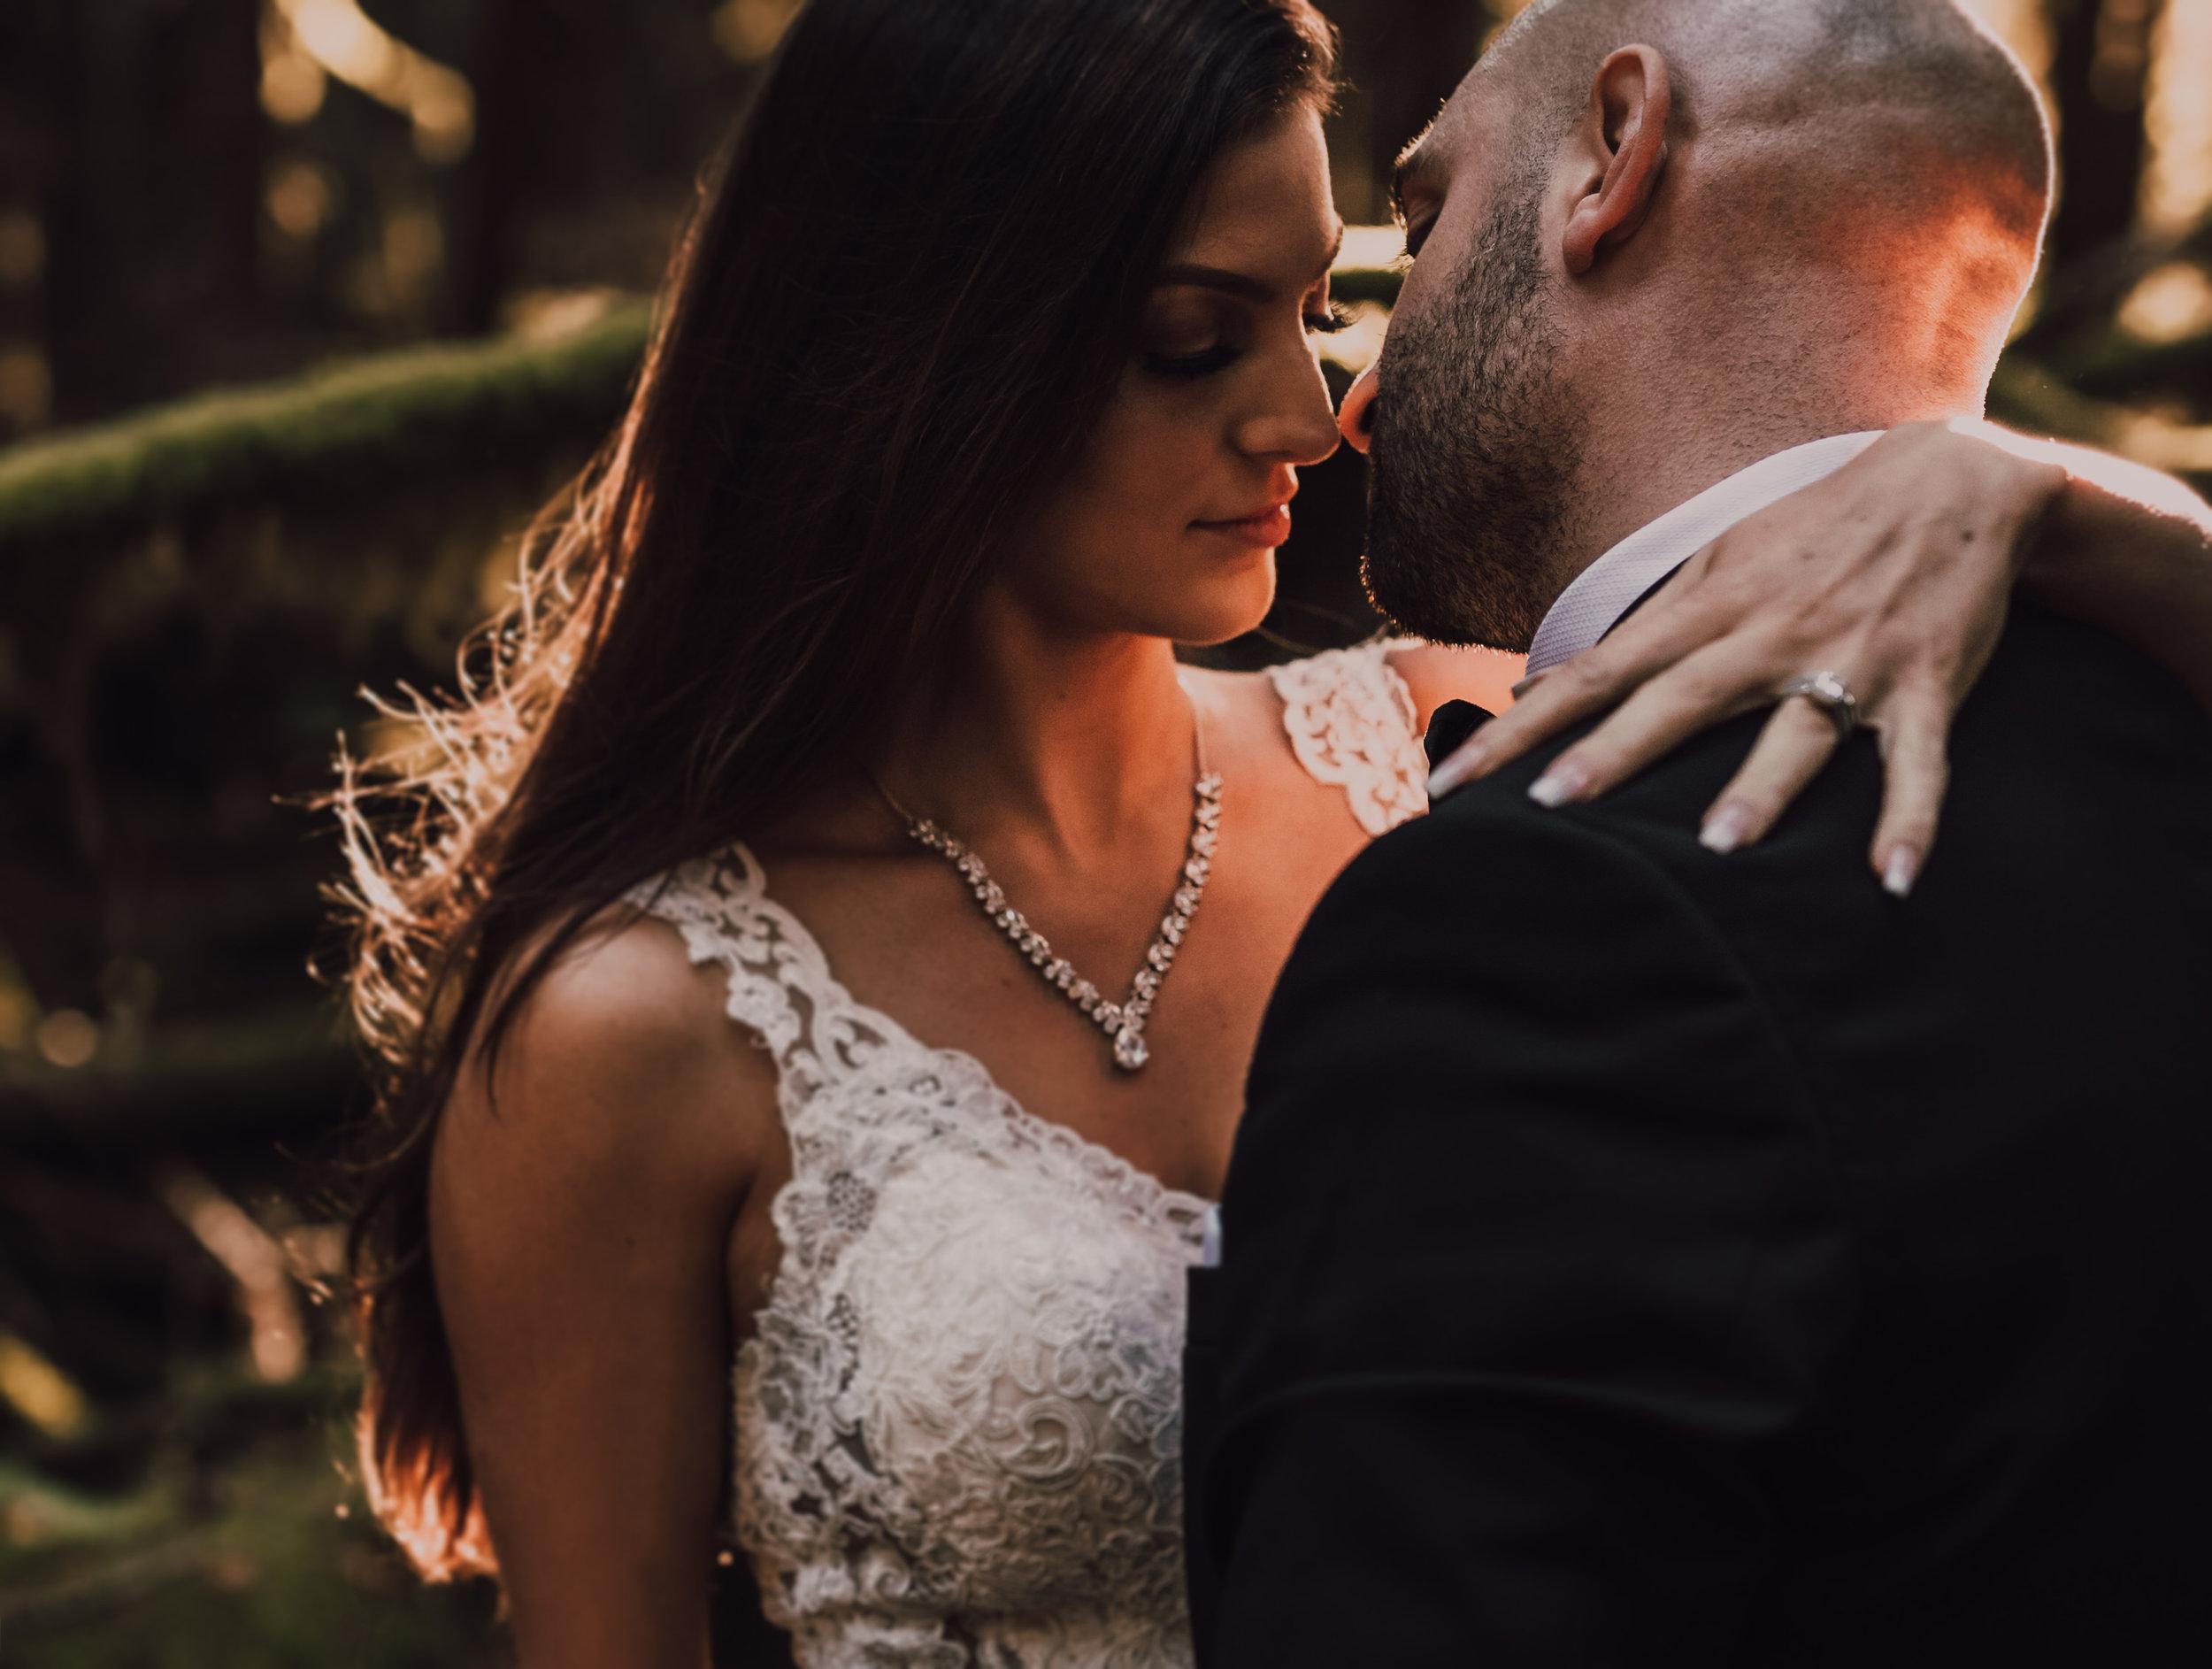 Day After Wedding Photos - Sunshine Coast Wedding Photos - Sunset Wedding Photos - Vancouver Wedding Photographer & Videographer - Sunshine Coast Wedding Photos - Sunshine Coast Wedding Photographer - Jennifer Picard Photography - 1A5A8150.jpg